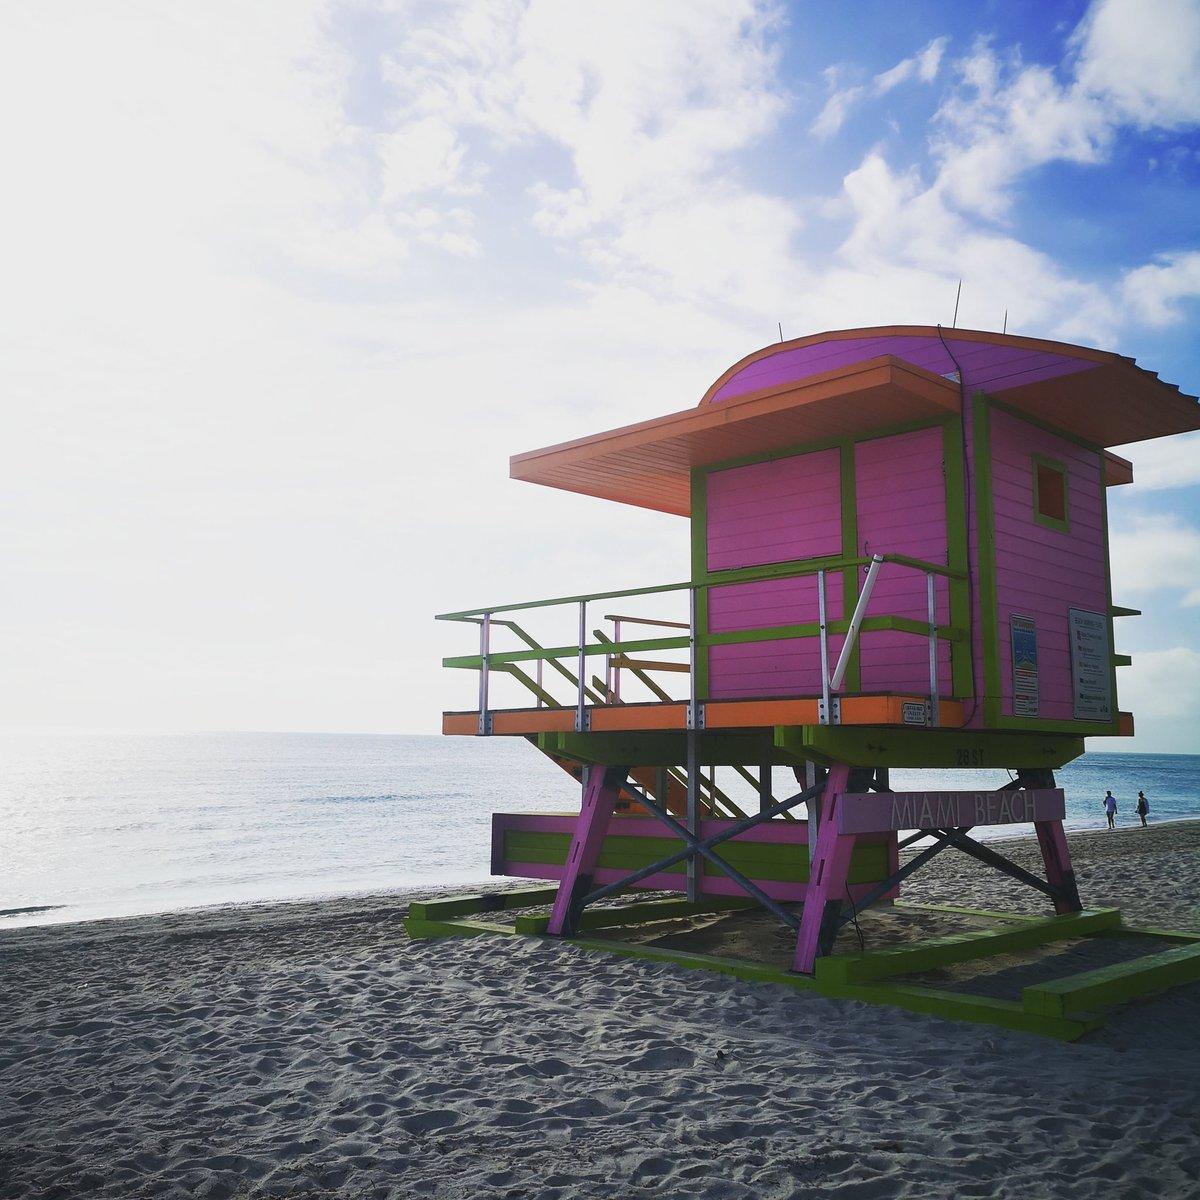 Morning beach run #miami #MiamiBeach Feeling very lucky :) #instatravel #lifeguard #artdeco #fitnesspic.twitter.com/YGTZEdcbQj